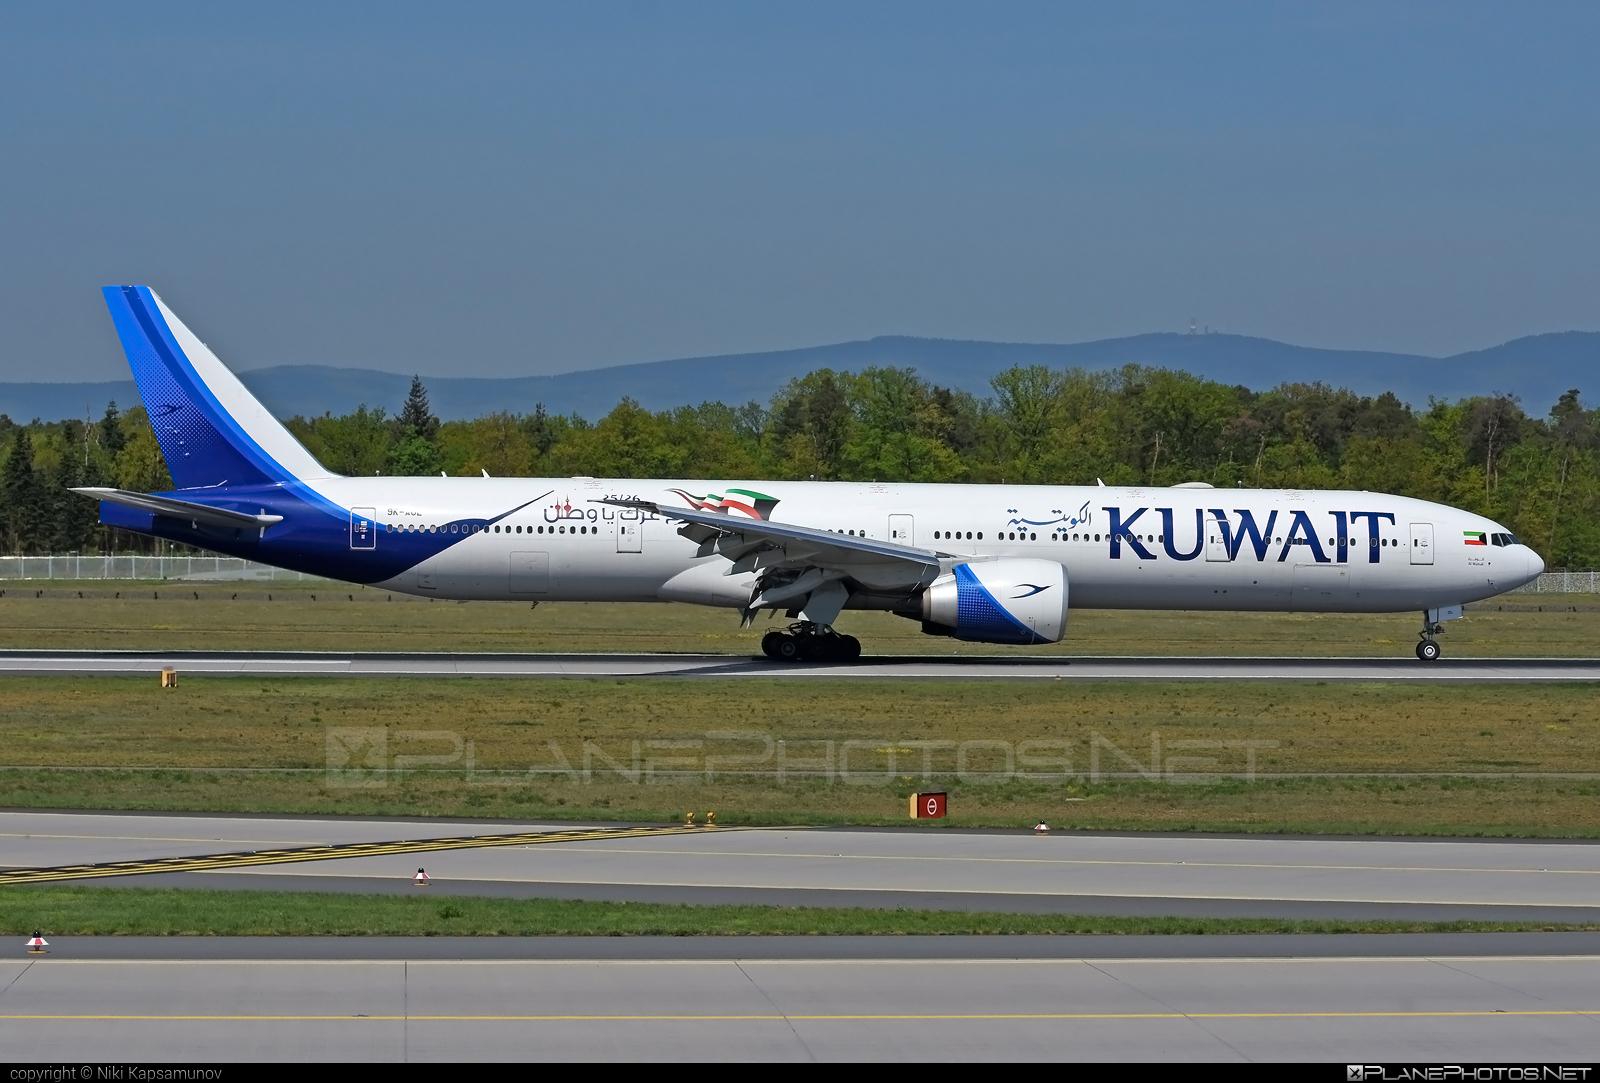 Boeing 777-300ER - 9K-AOL operated by Kuwait Airways #b777 #b777er #boeing #boeing777 #tripleseven